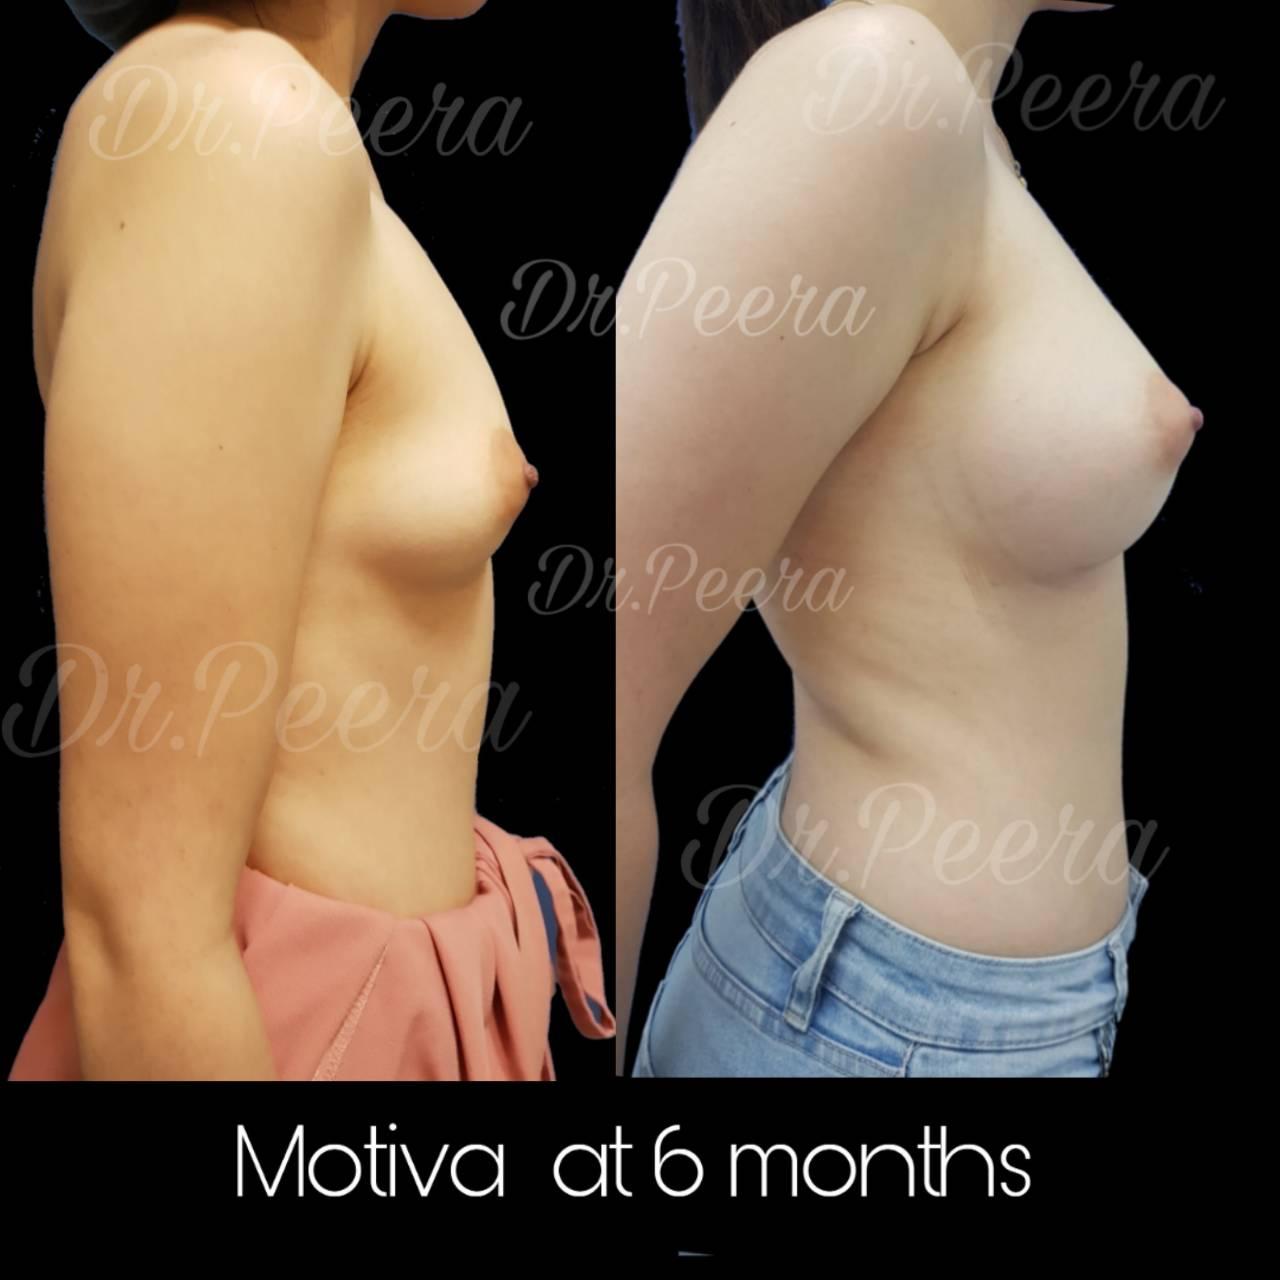 Pscclinic - รีวิว เสริมหน้าอก Breast augmentation ตอนที่ 2/2